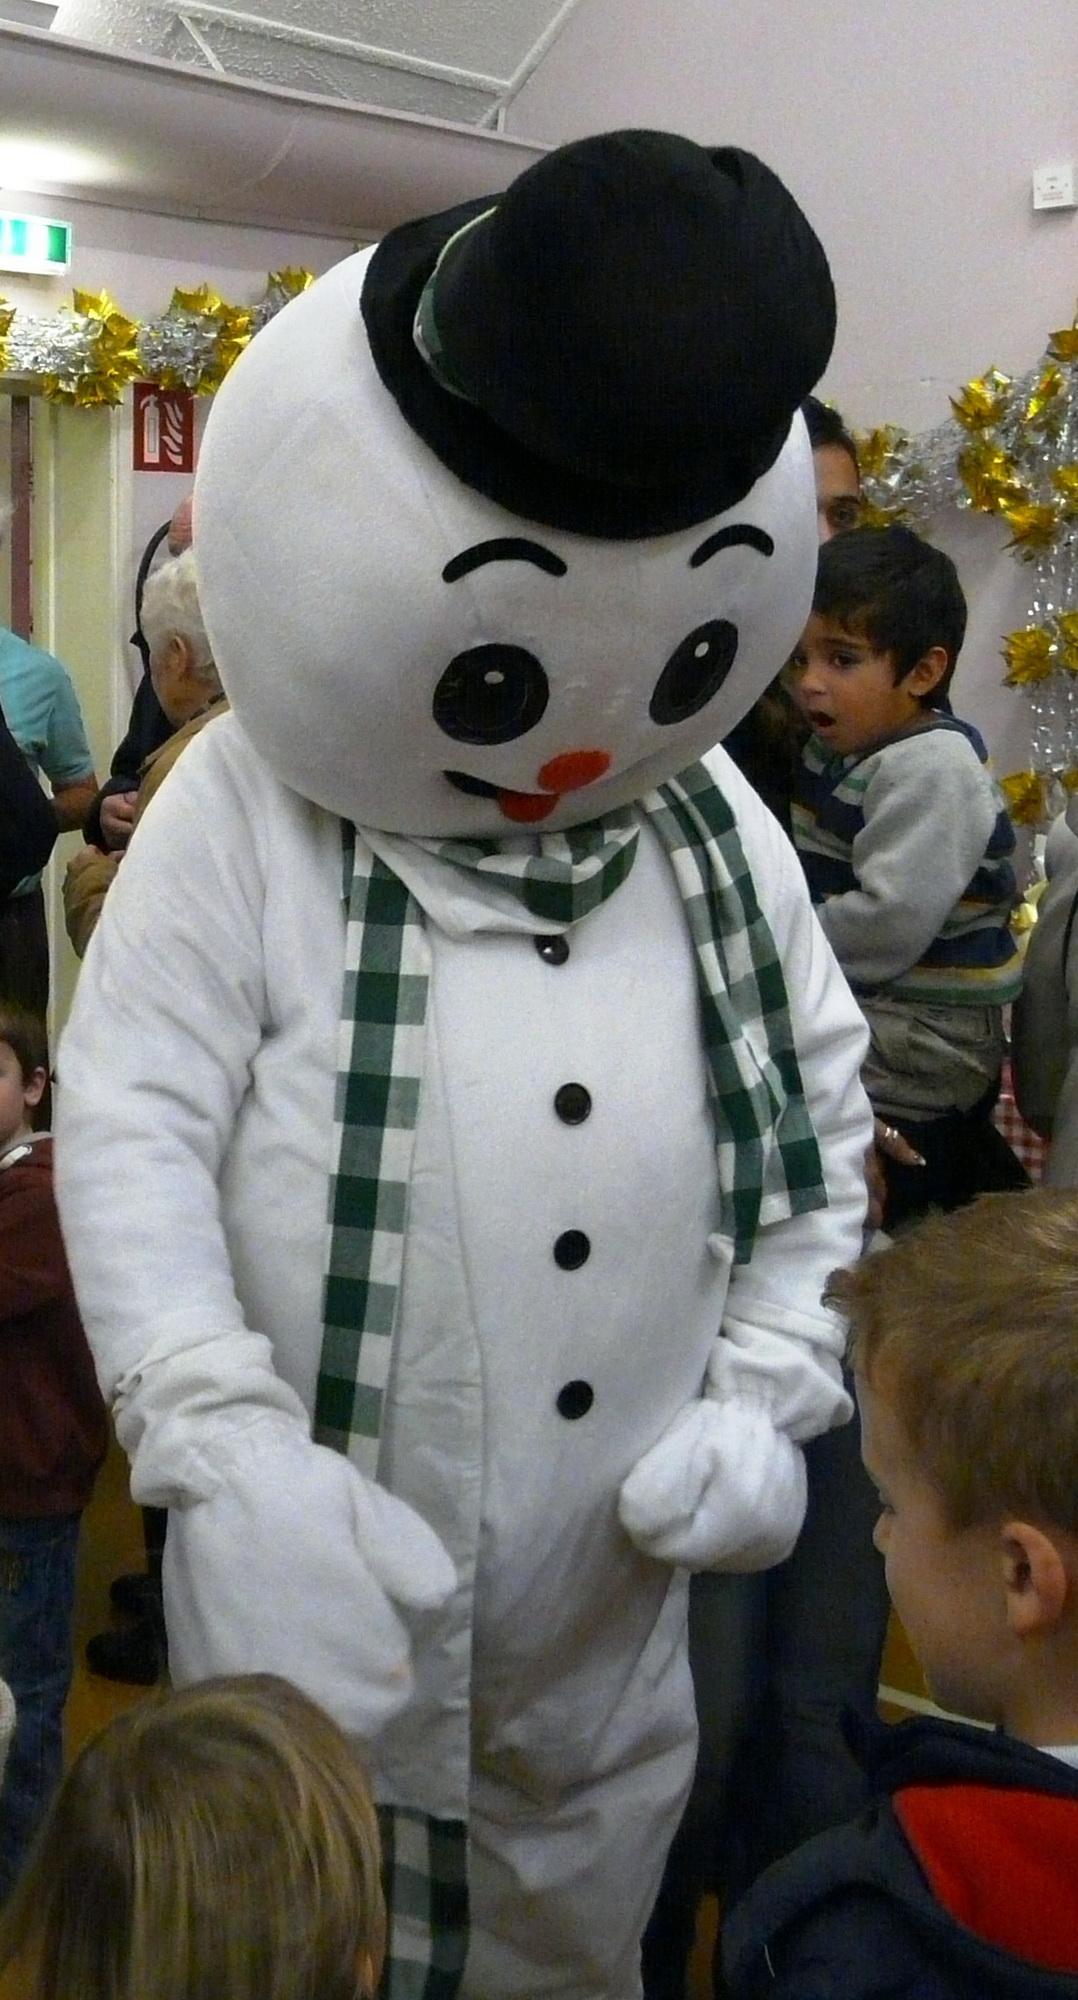 Mr Snowman chatting to the children